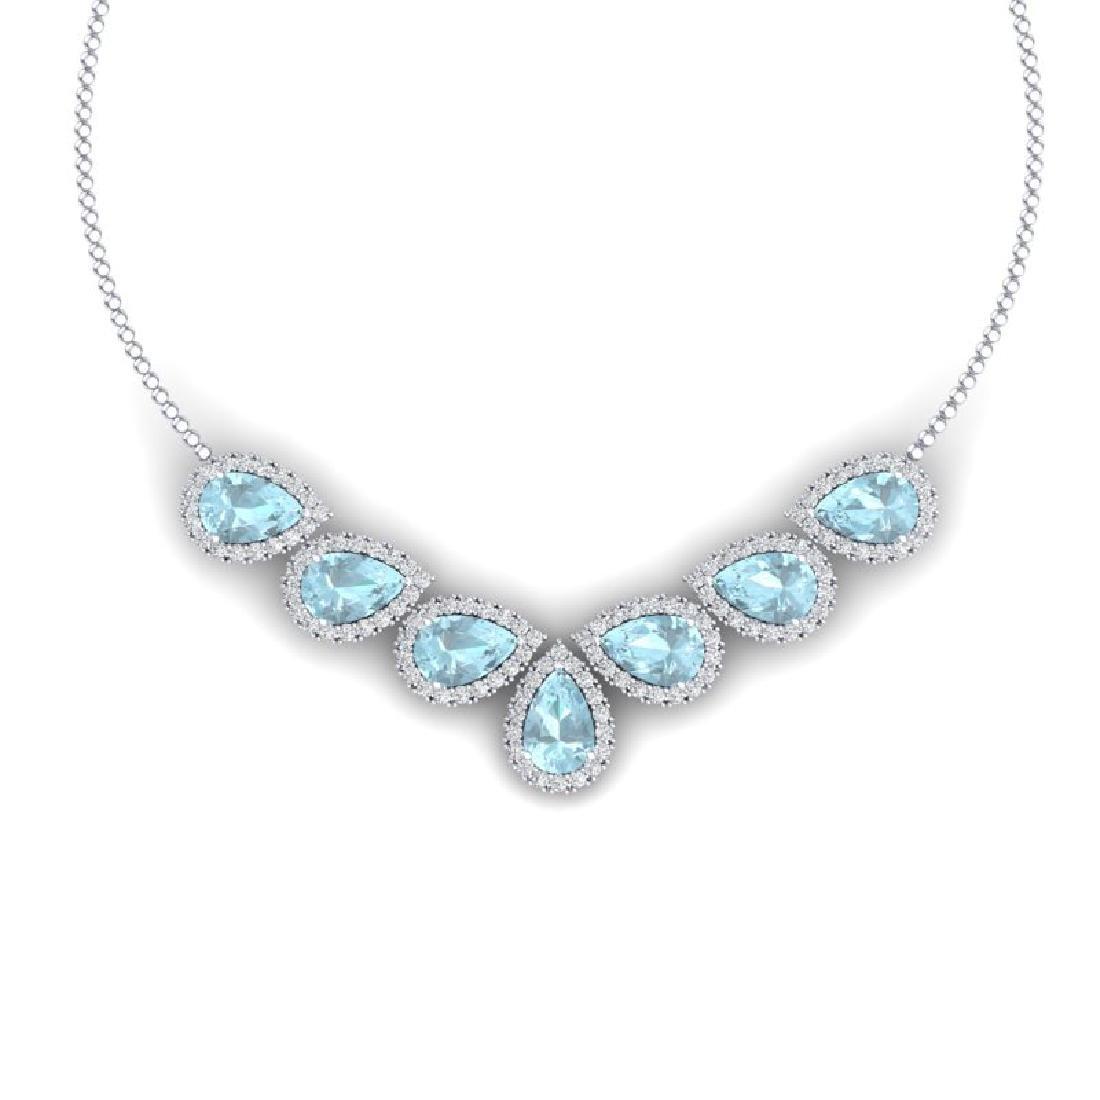 36.24 CTW Royalty Sky Topaz & VS Diamond Necklace 18K